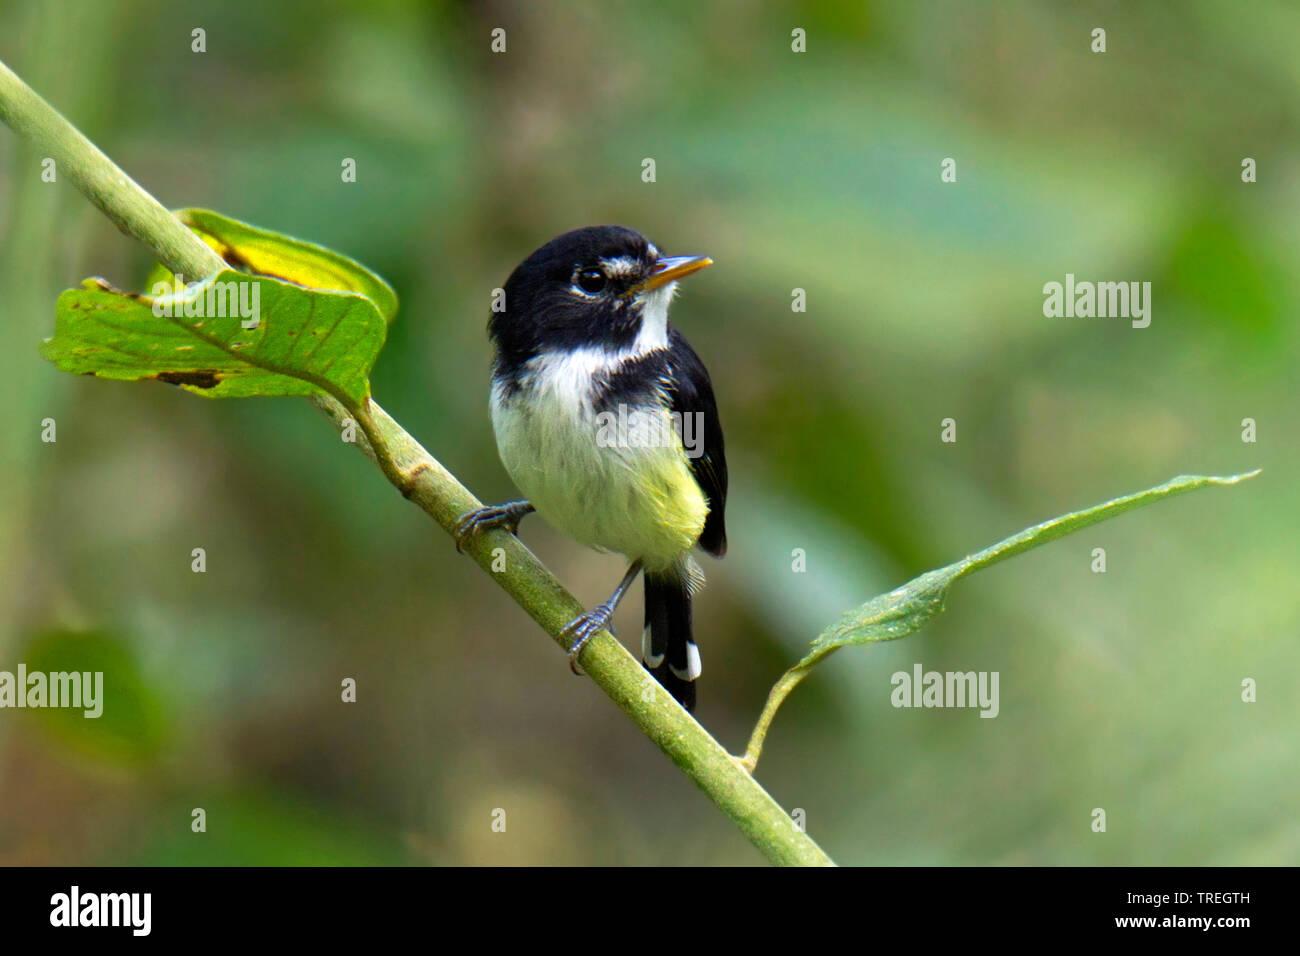 Schwarzweiss-Todityrann, Schwarzweisstodityrann (Poecilotriccus capitalis), auf einem Zweig, Suedamerika | Black-and-white Tody-Flycatcher, Poecilotri - Stock Image